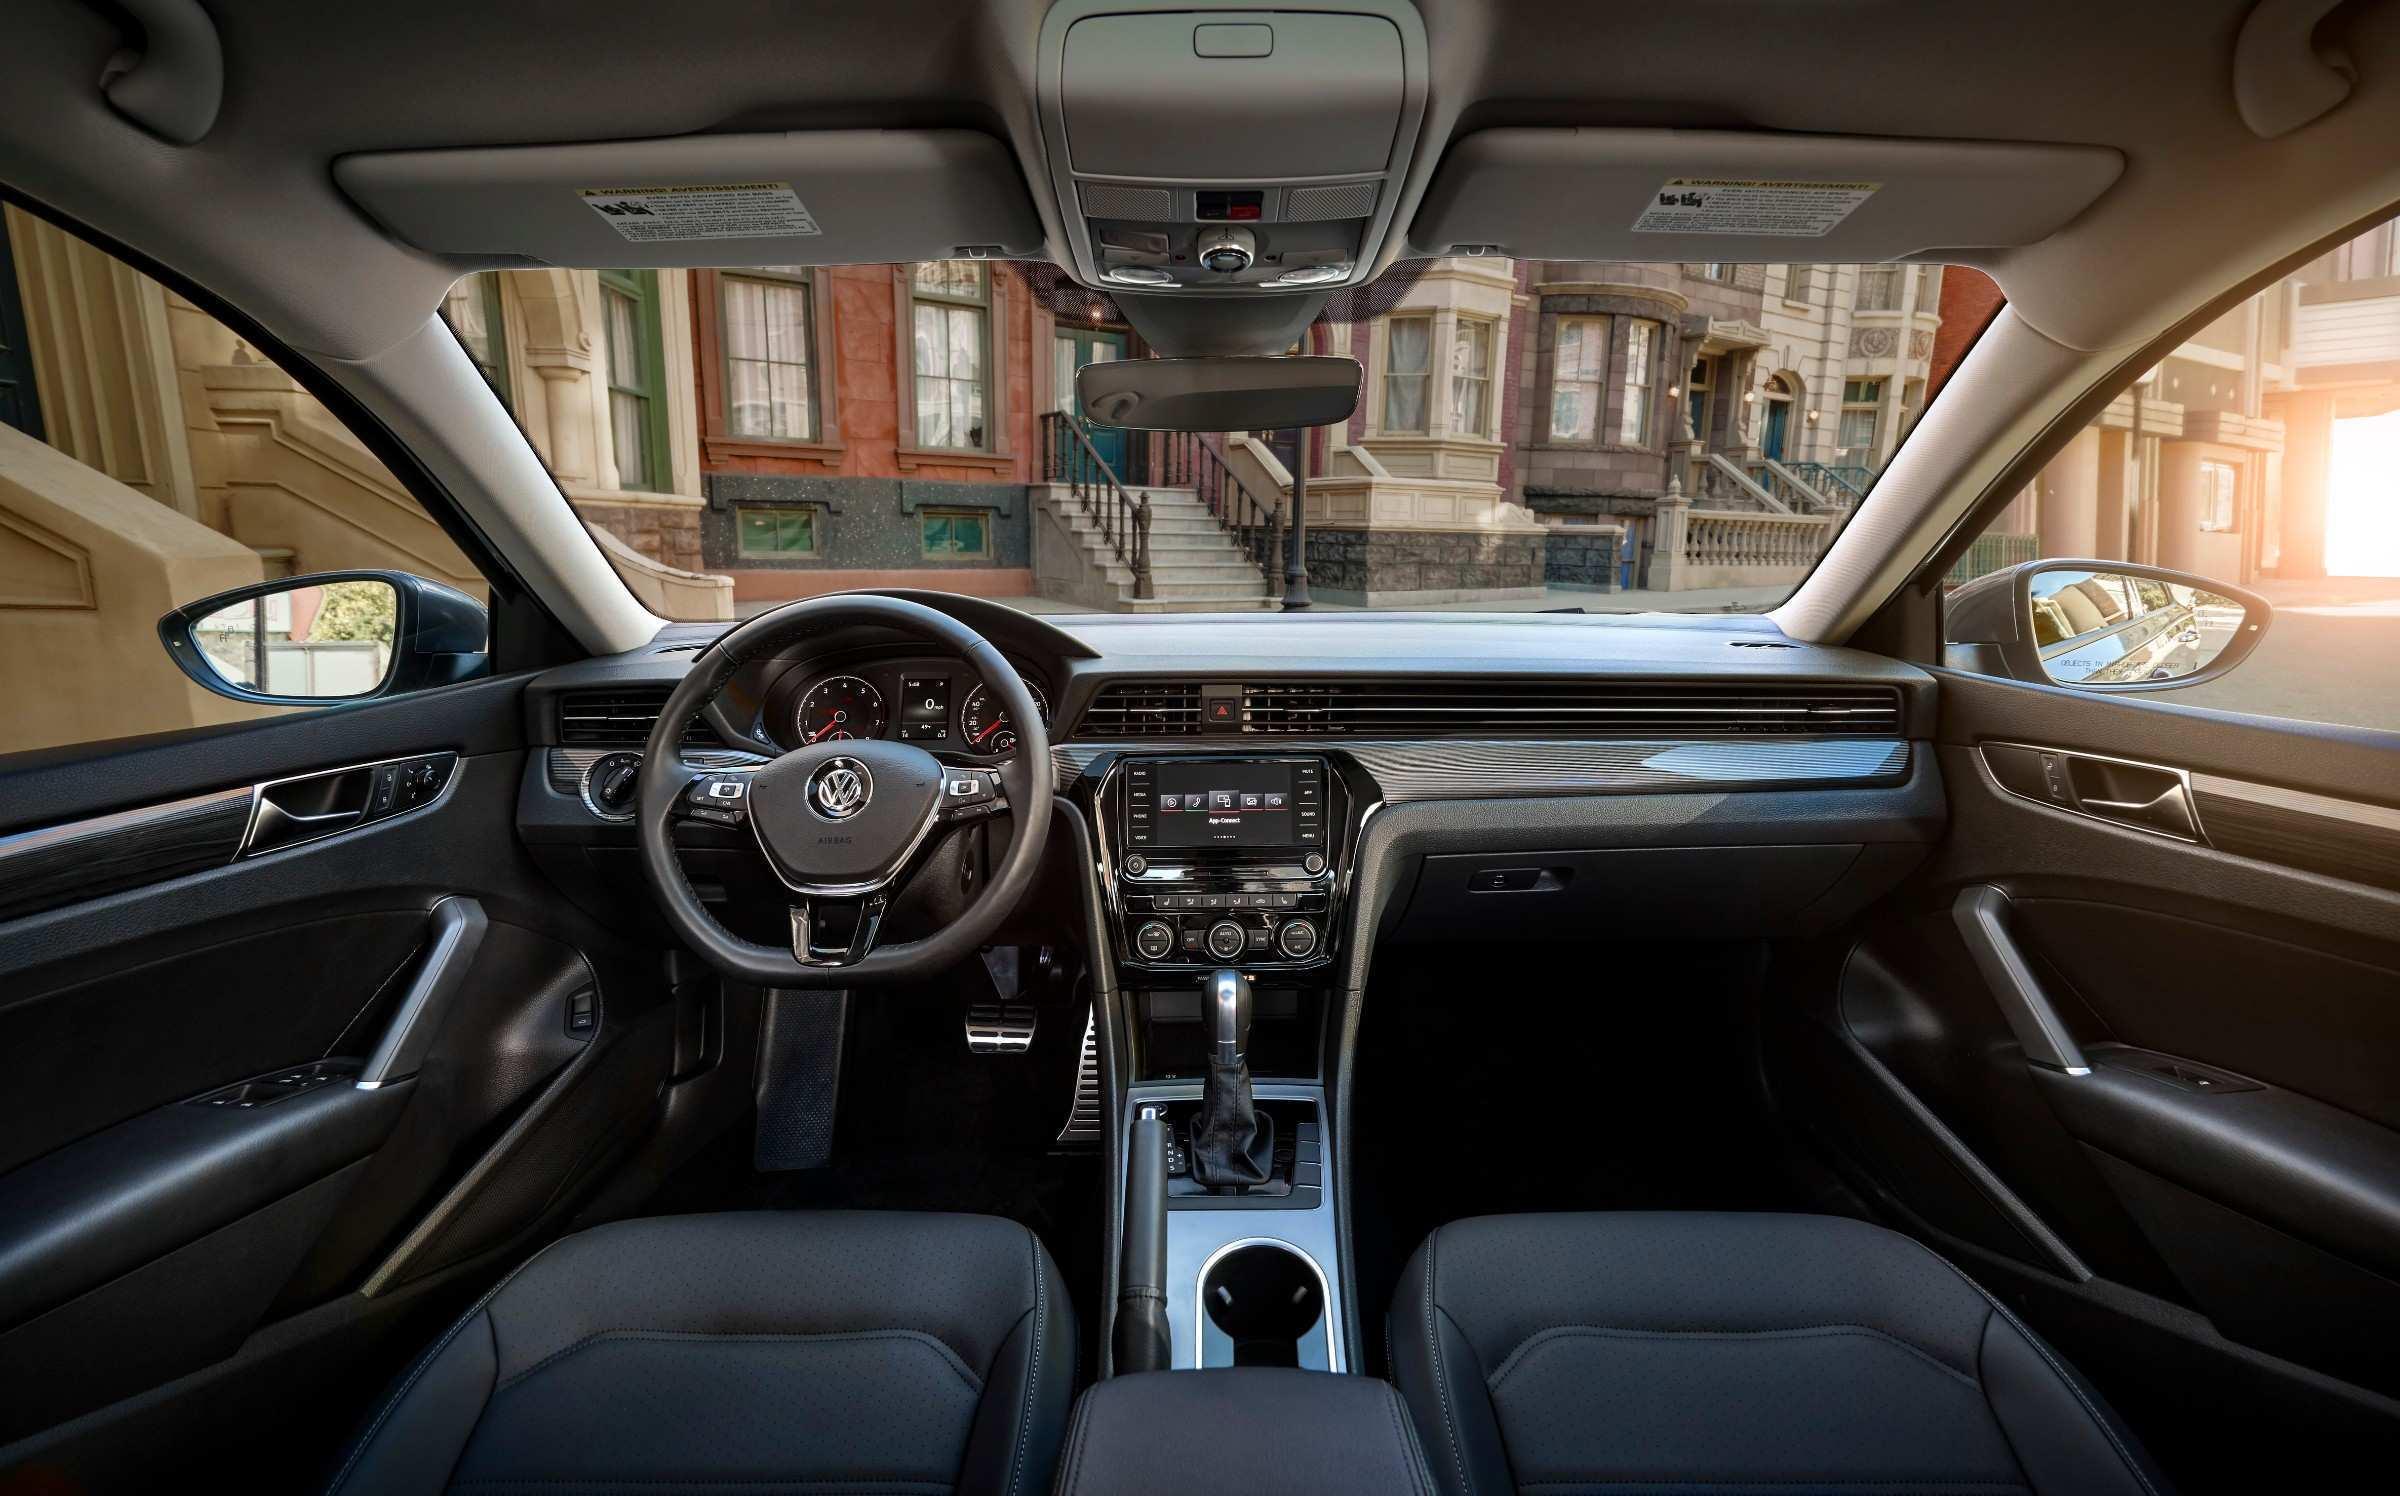 33 Concept of Volkswagen New Passat 2020 Picture by Volkswagen New Passat 2020